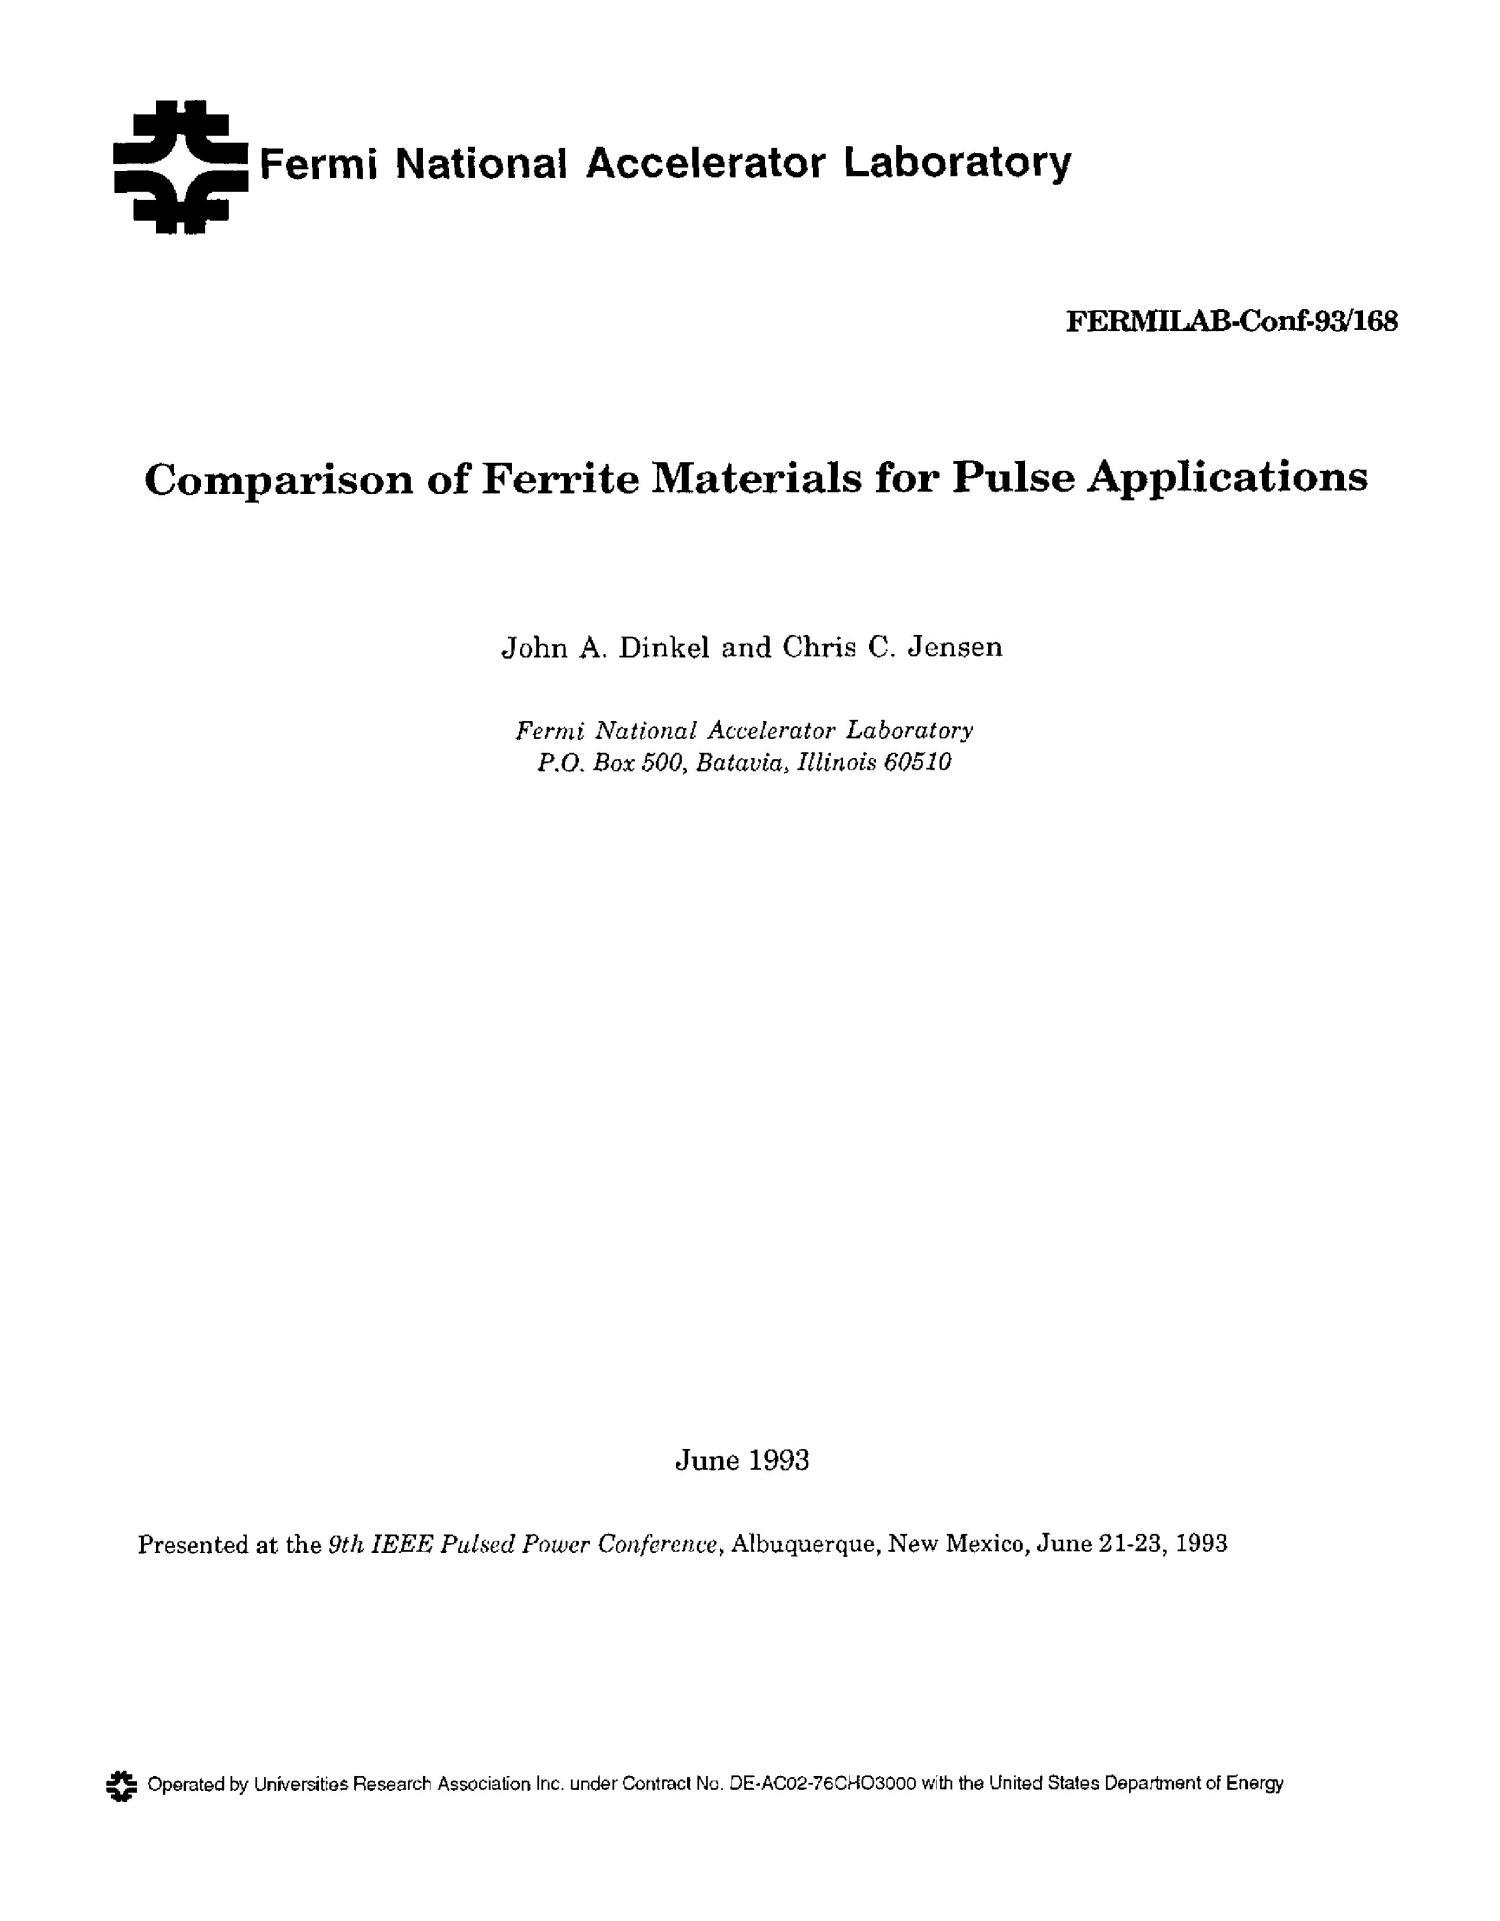 Comparison of ferrite materials for pulse applications - Digital Library